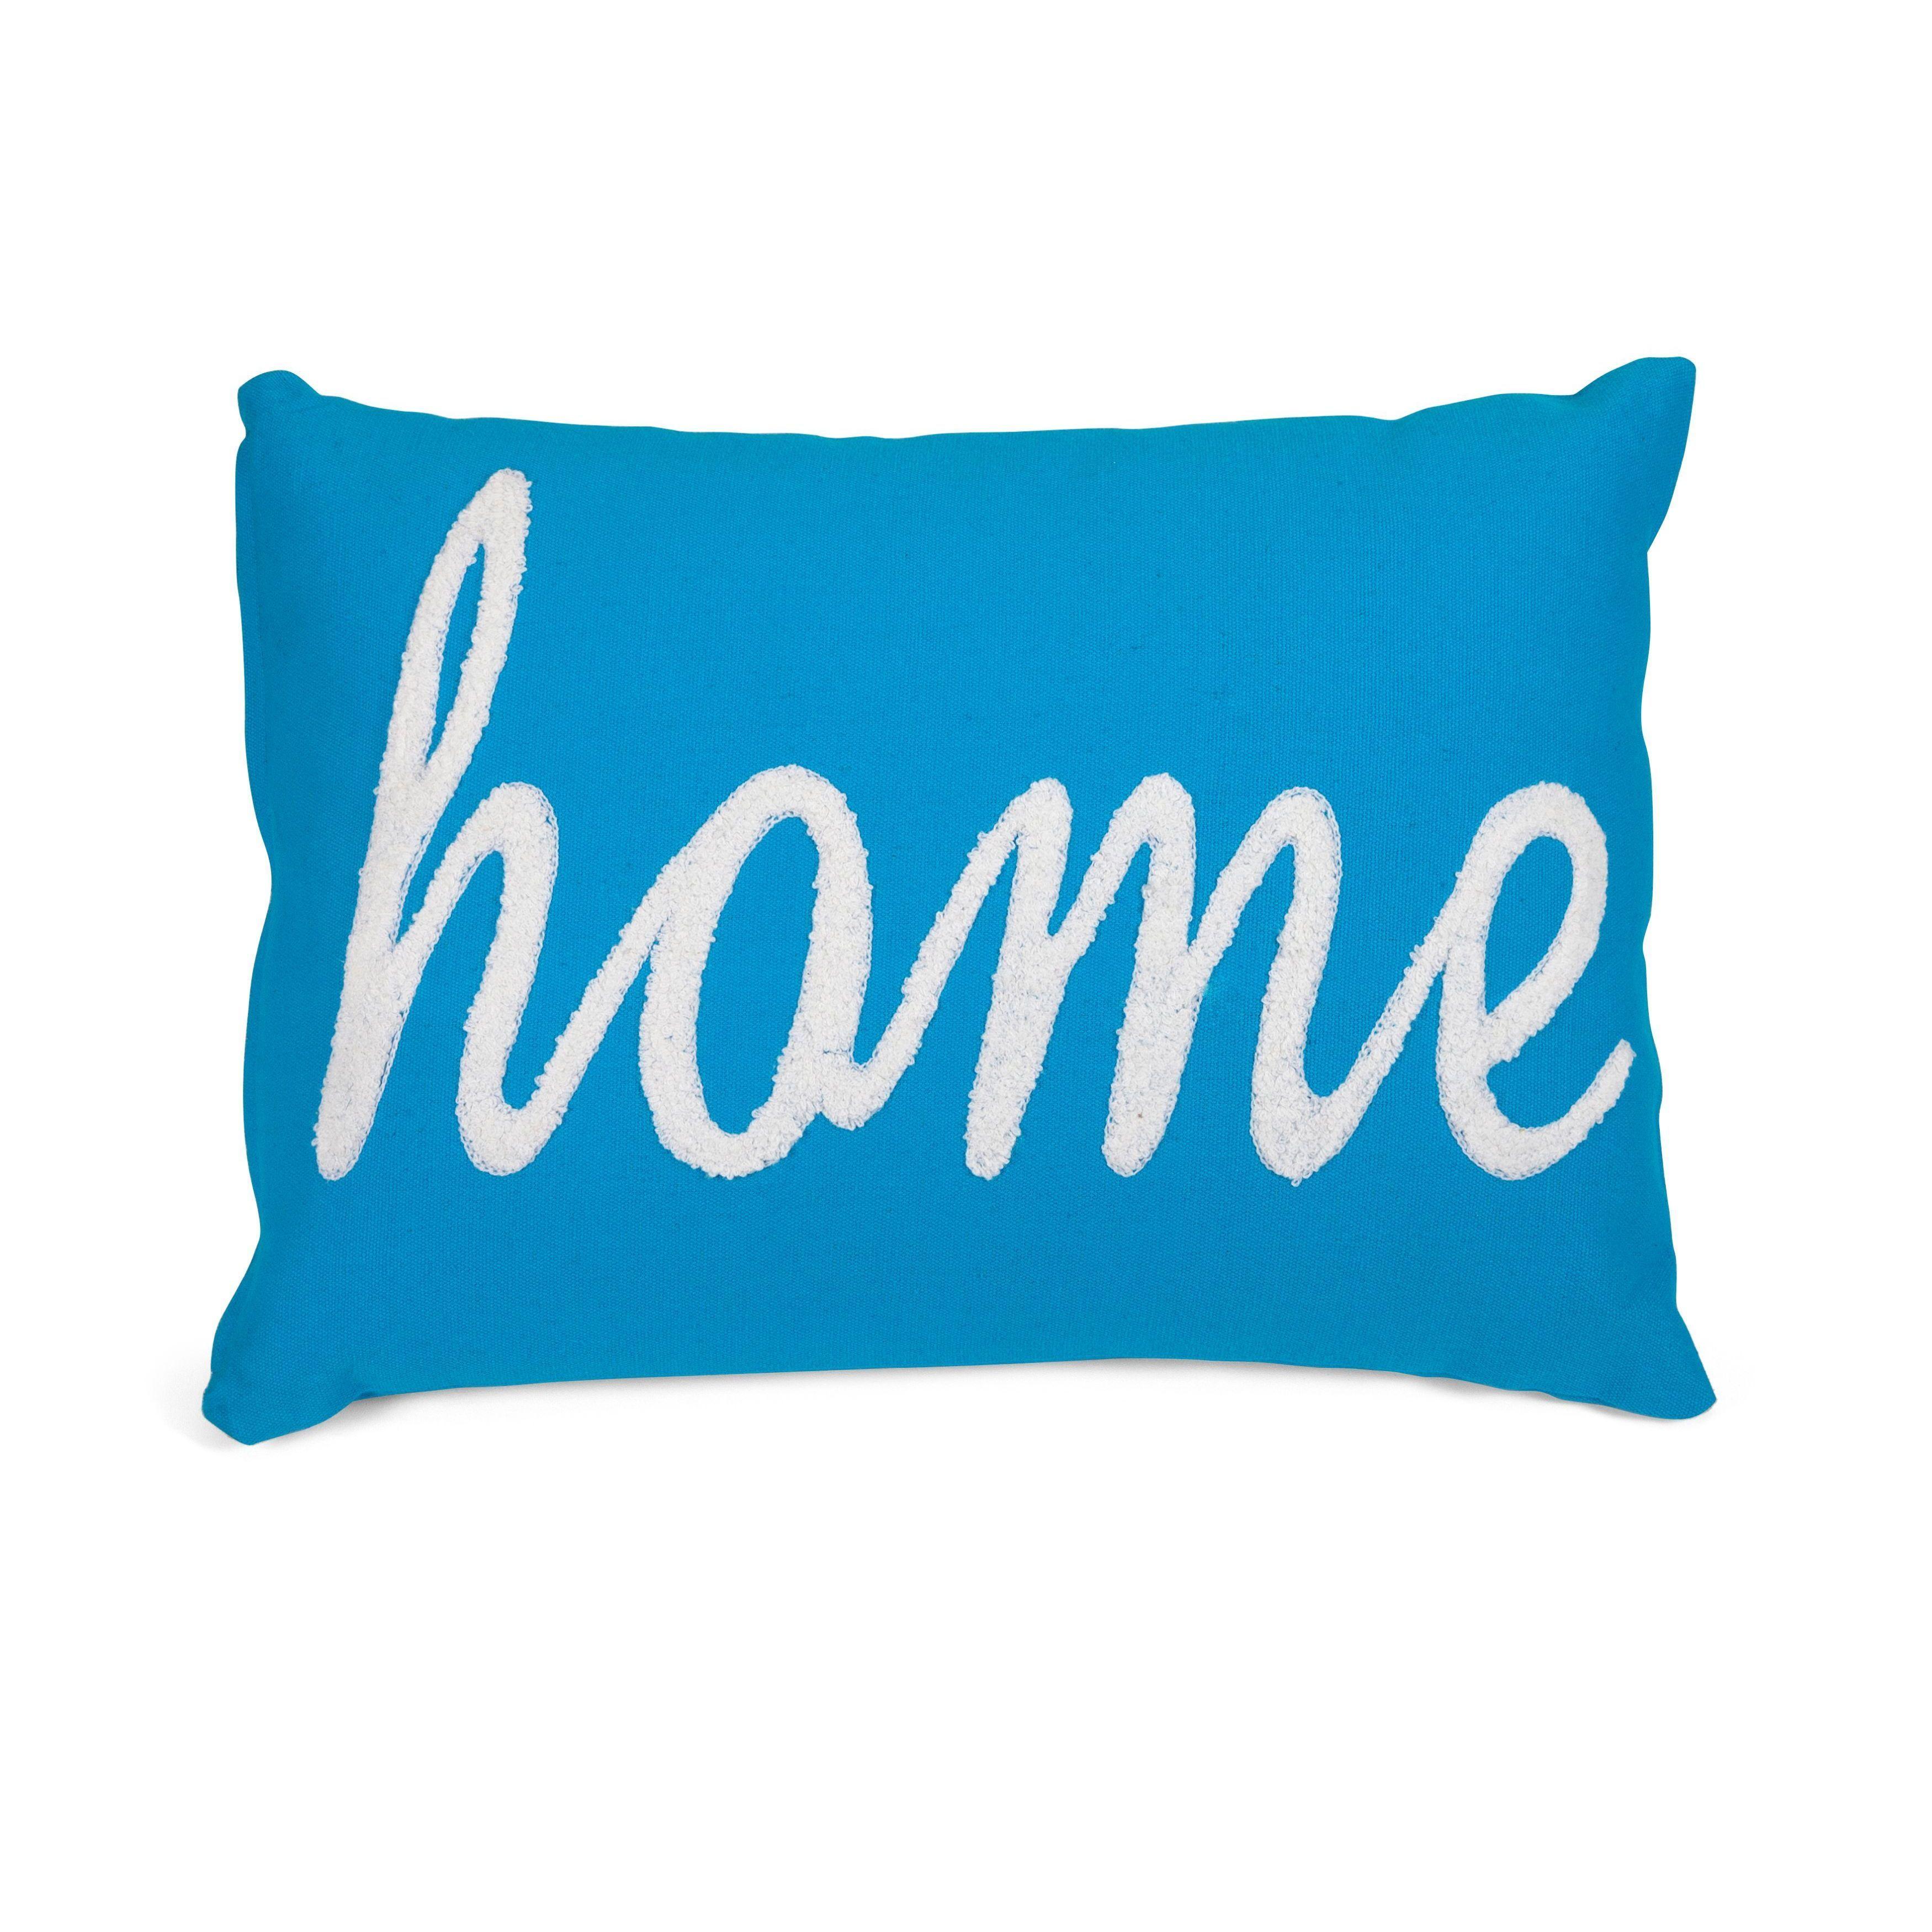 Imax suzie home throw pillow pillow blue cotton quotes